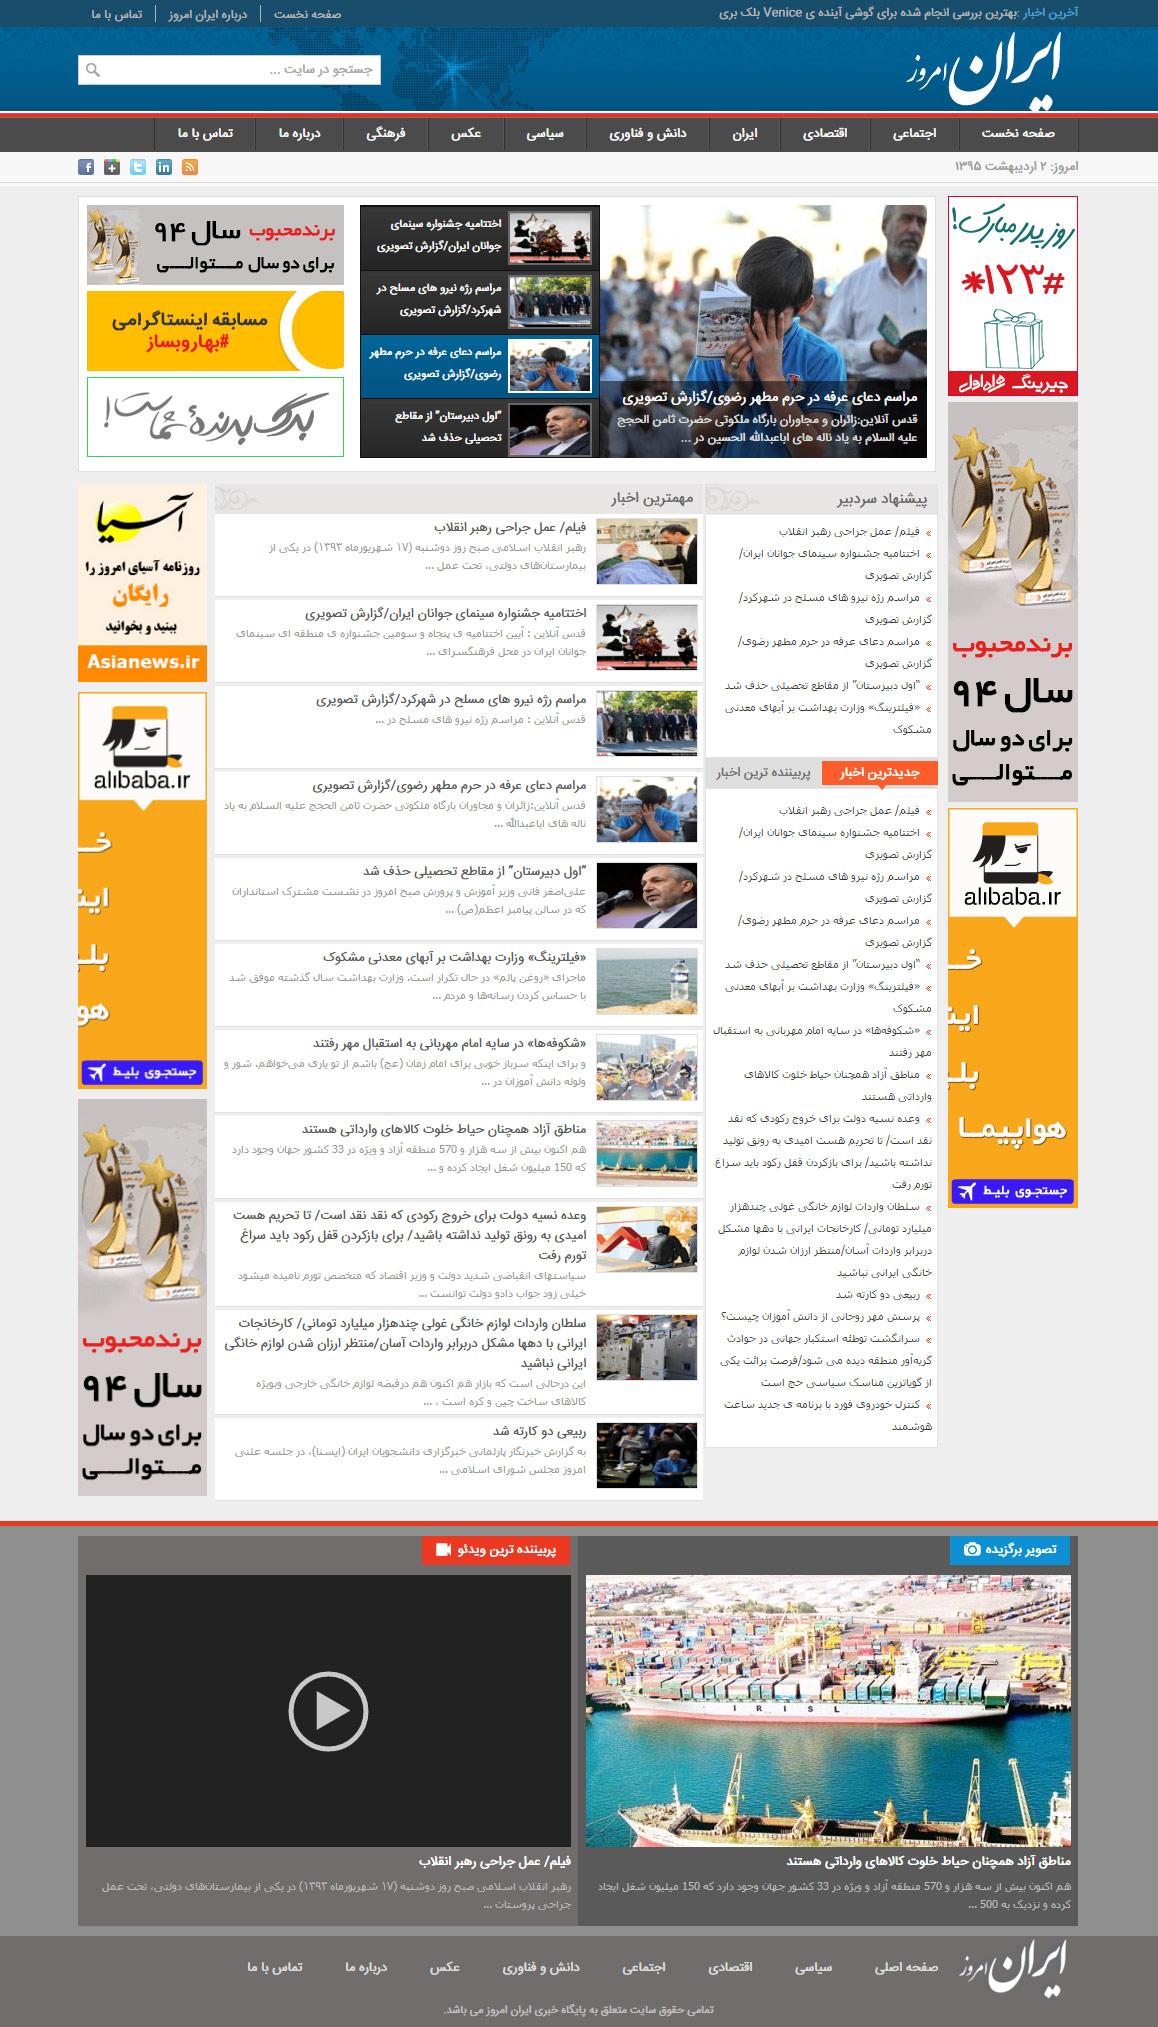 قالب وردپرس خبری ایران امروز | قالب خبری | قالب خبری وردپرس | قالب وردپرس | پوسته خبری